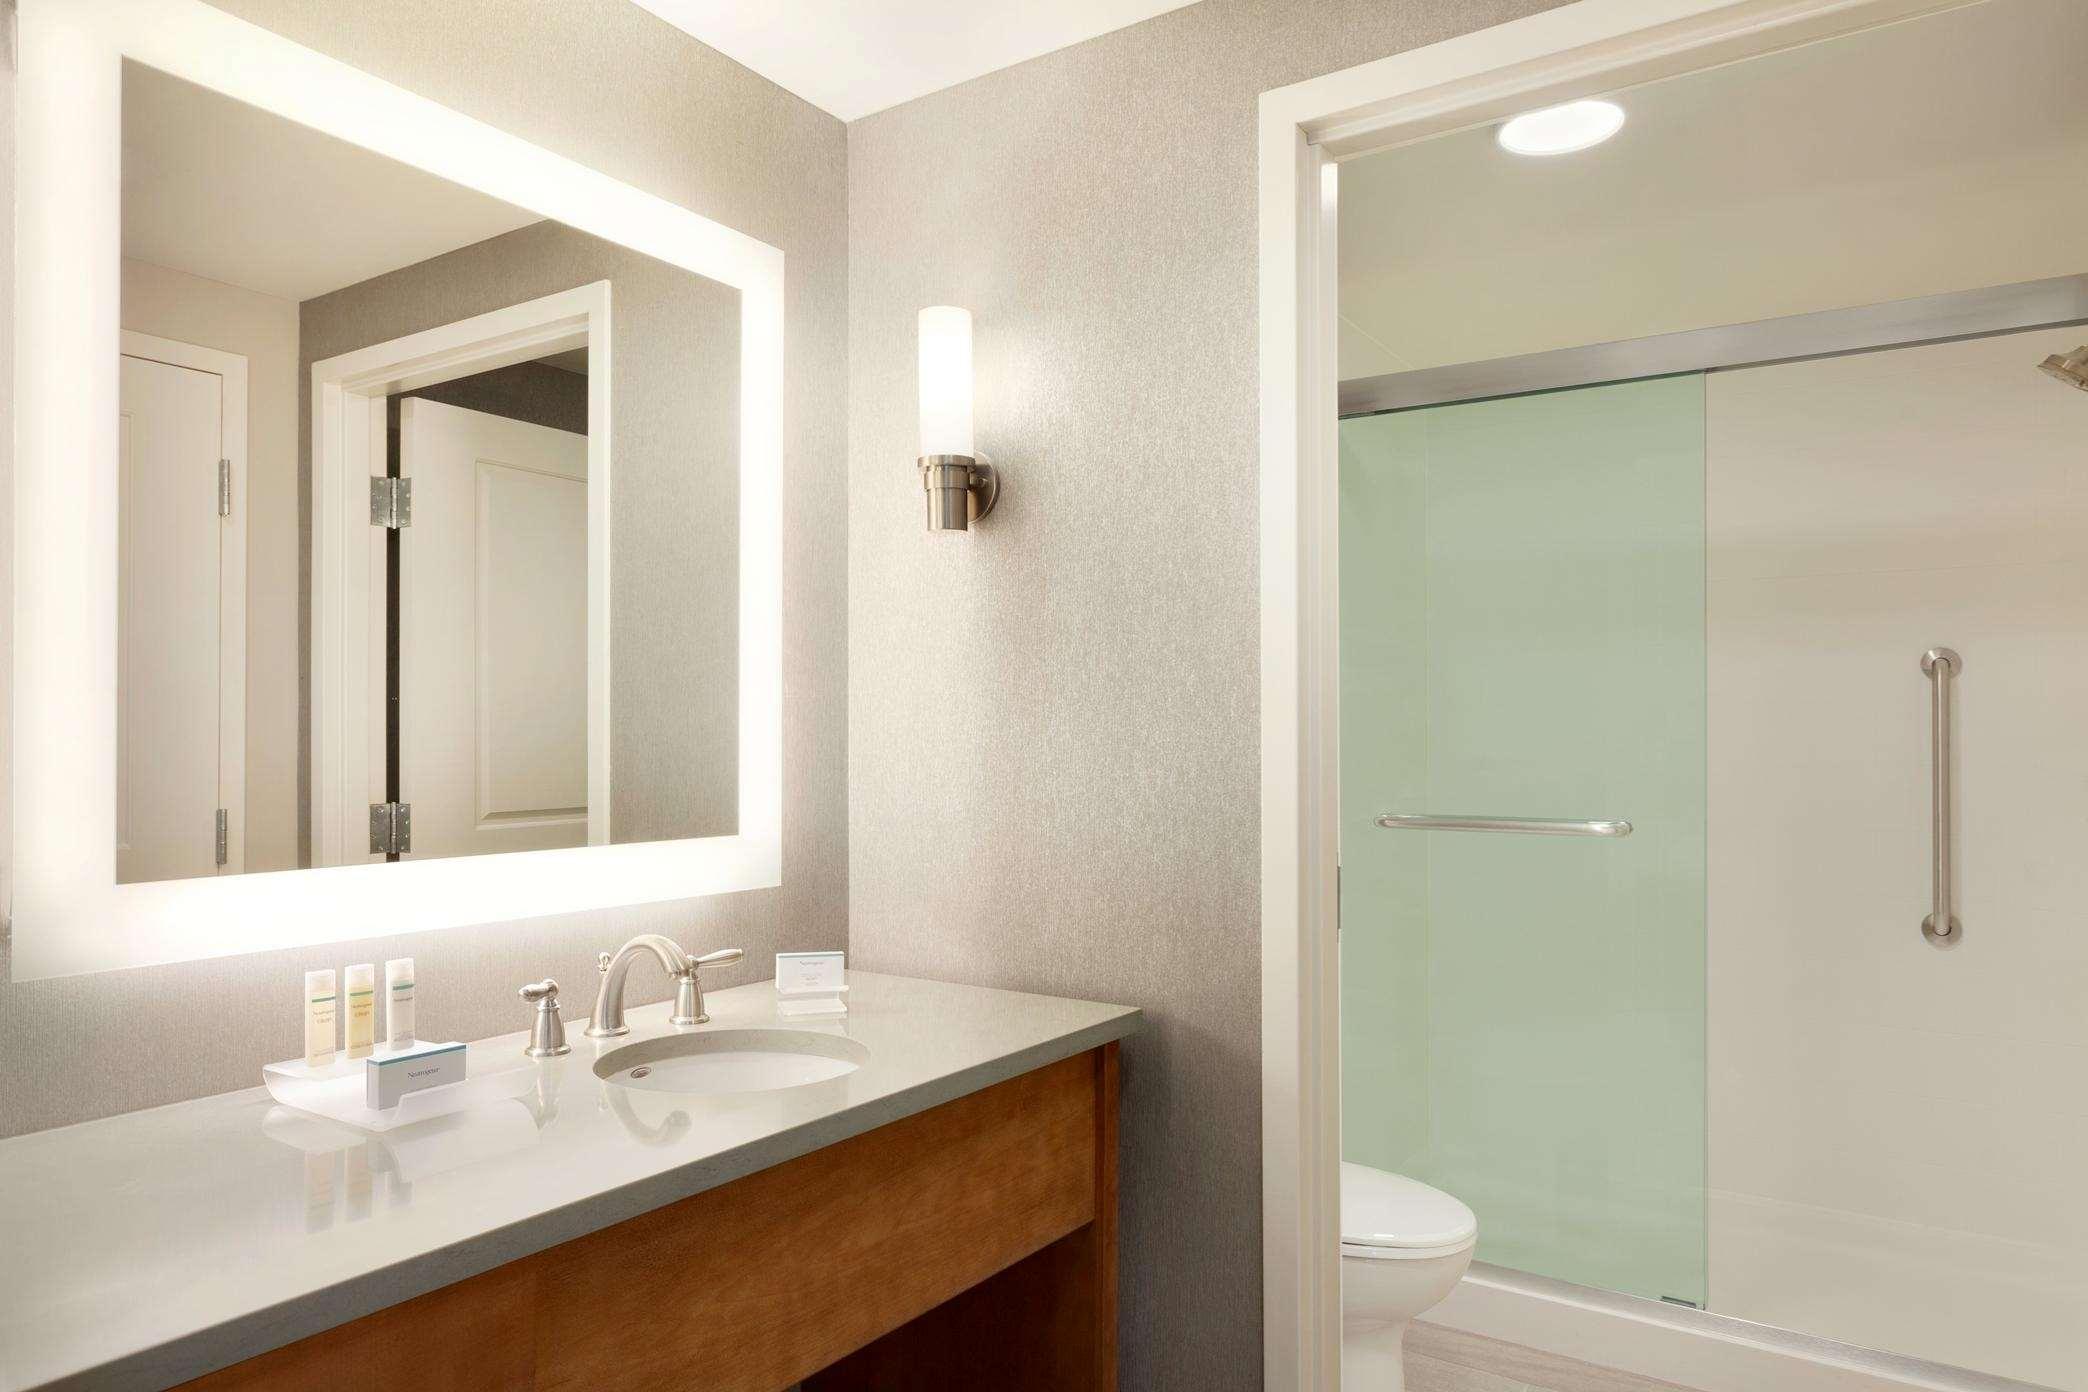 Homewood Suites by Hilton - Syracuse/Carrier Circle 6006 Fair Lakes ...